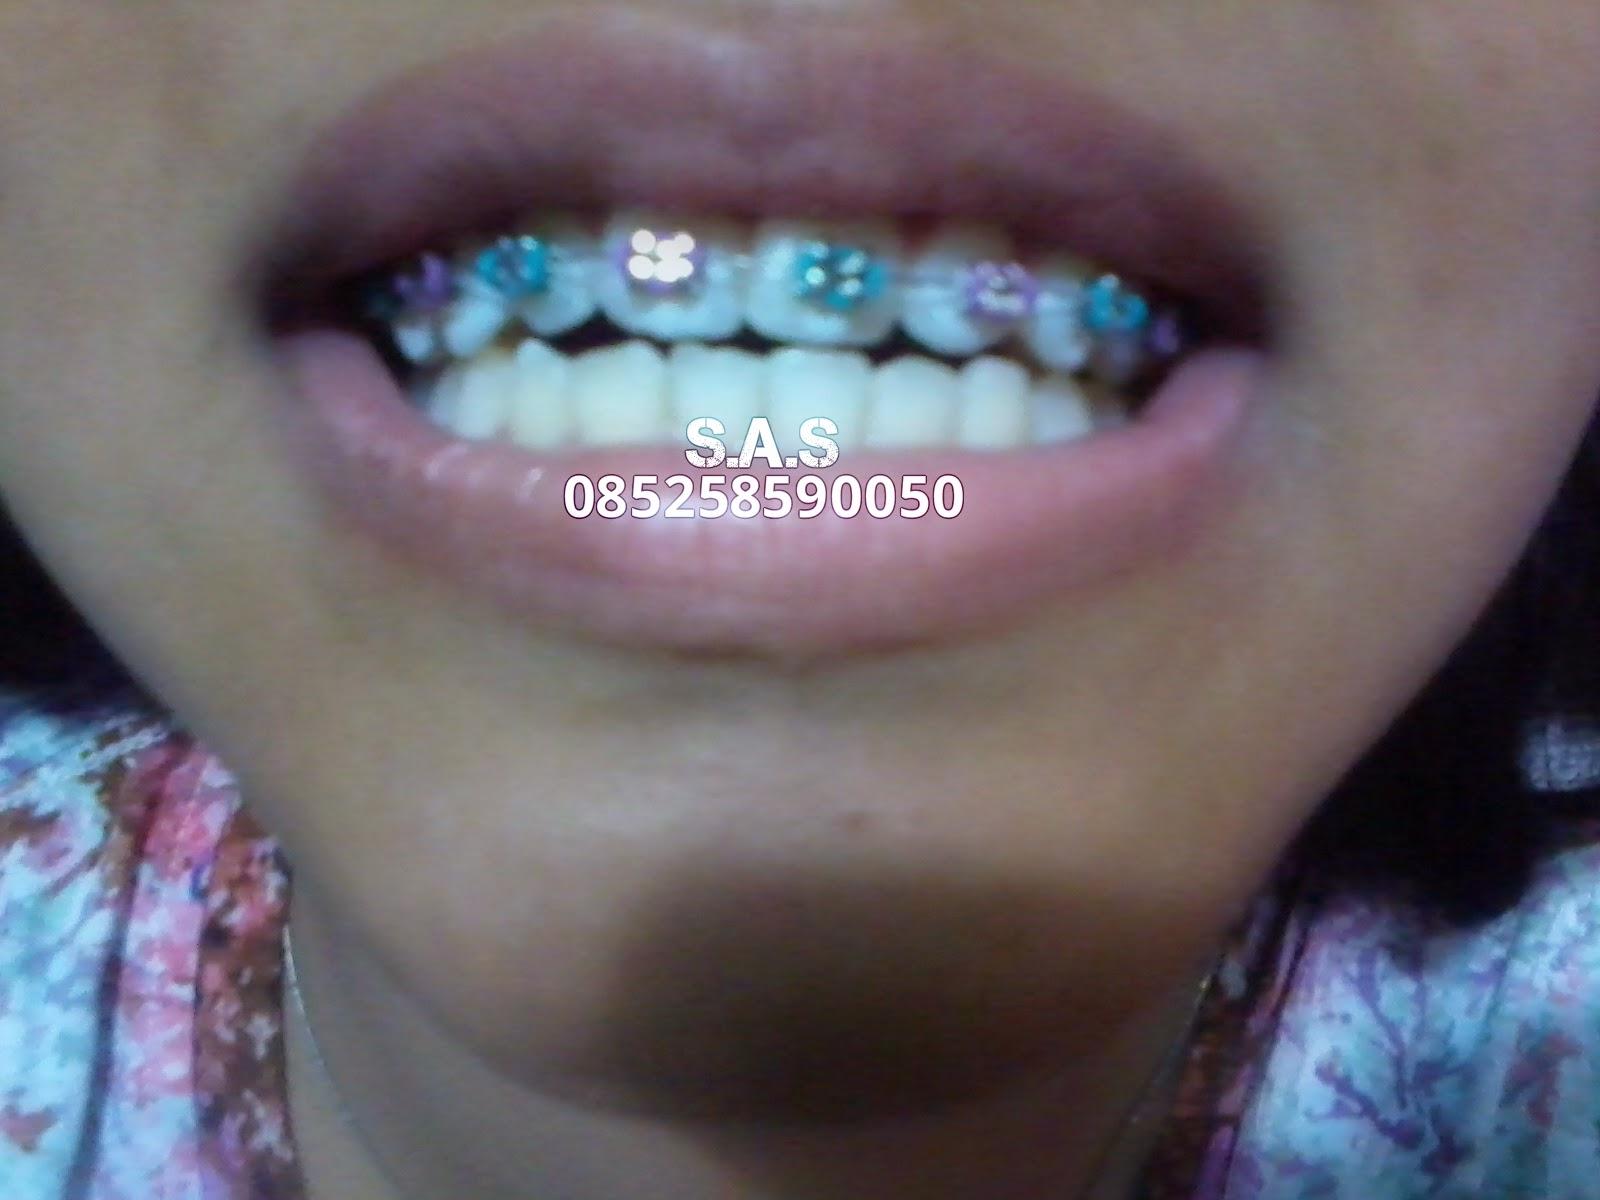 Dari yang Kurang Rapi Menjadi Lebih Rapi Tukang Gigi